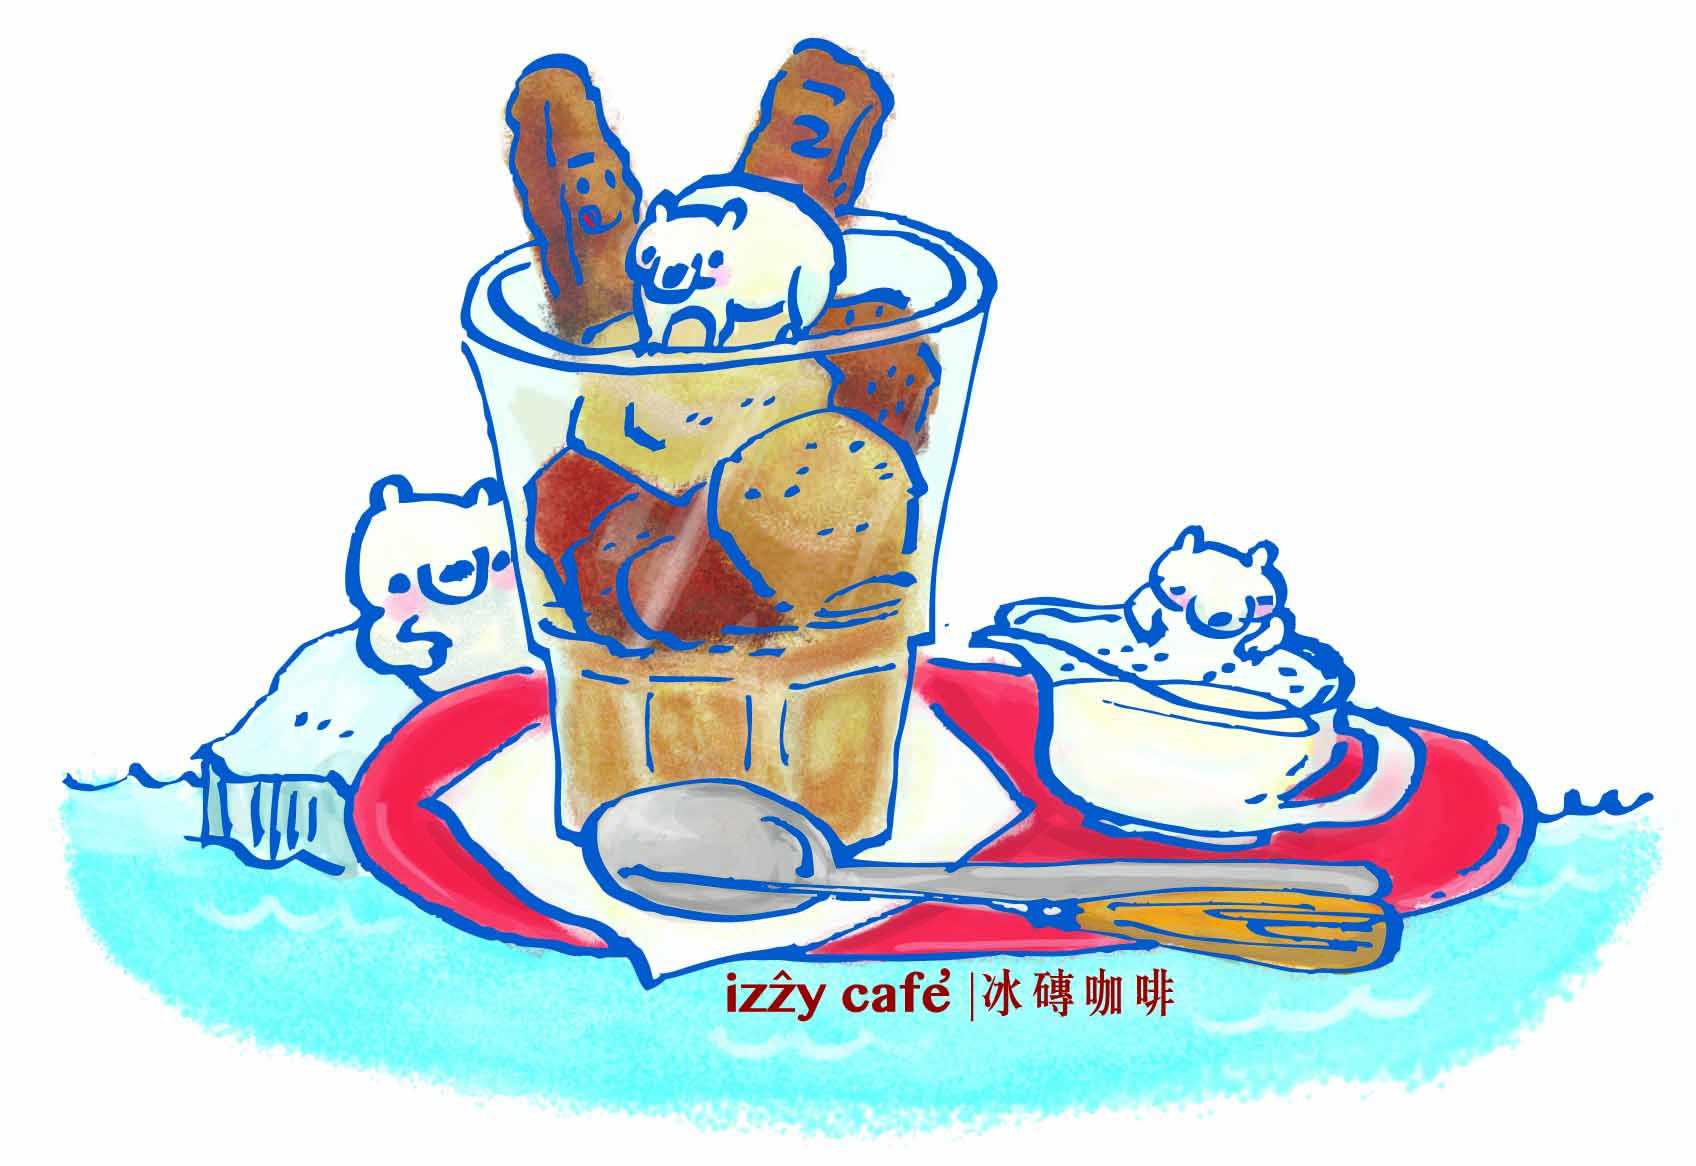 09-izzy cafe